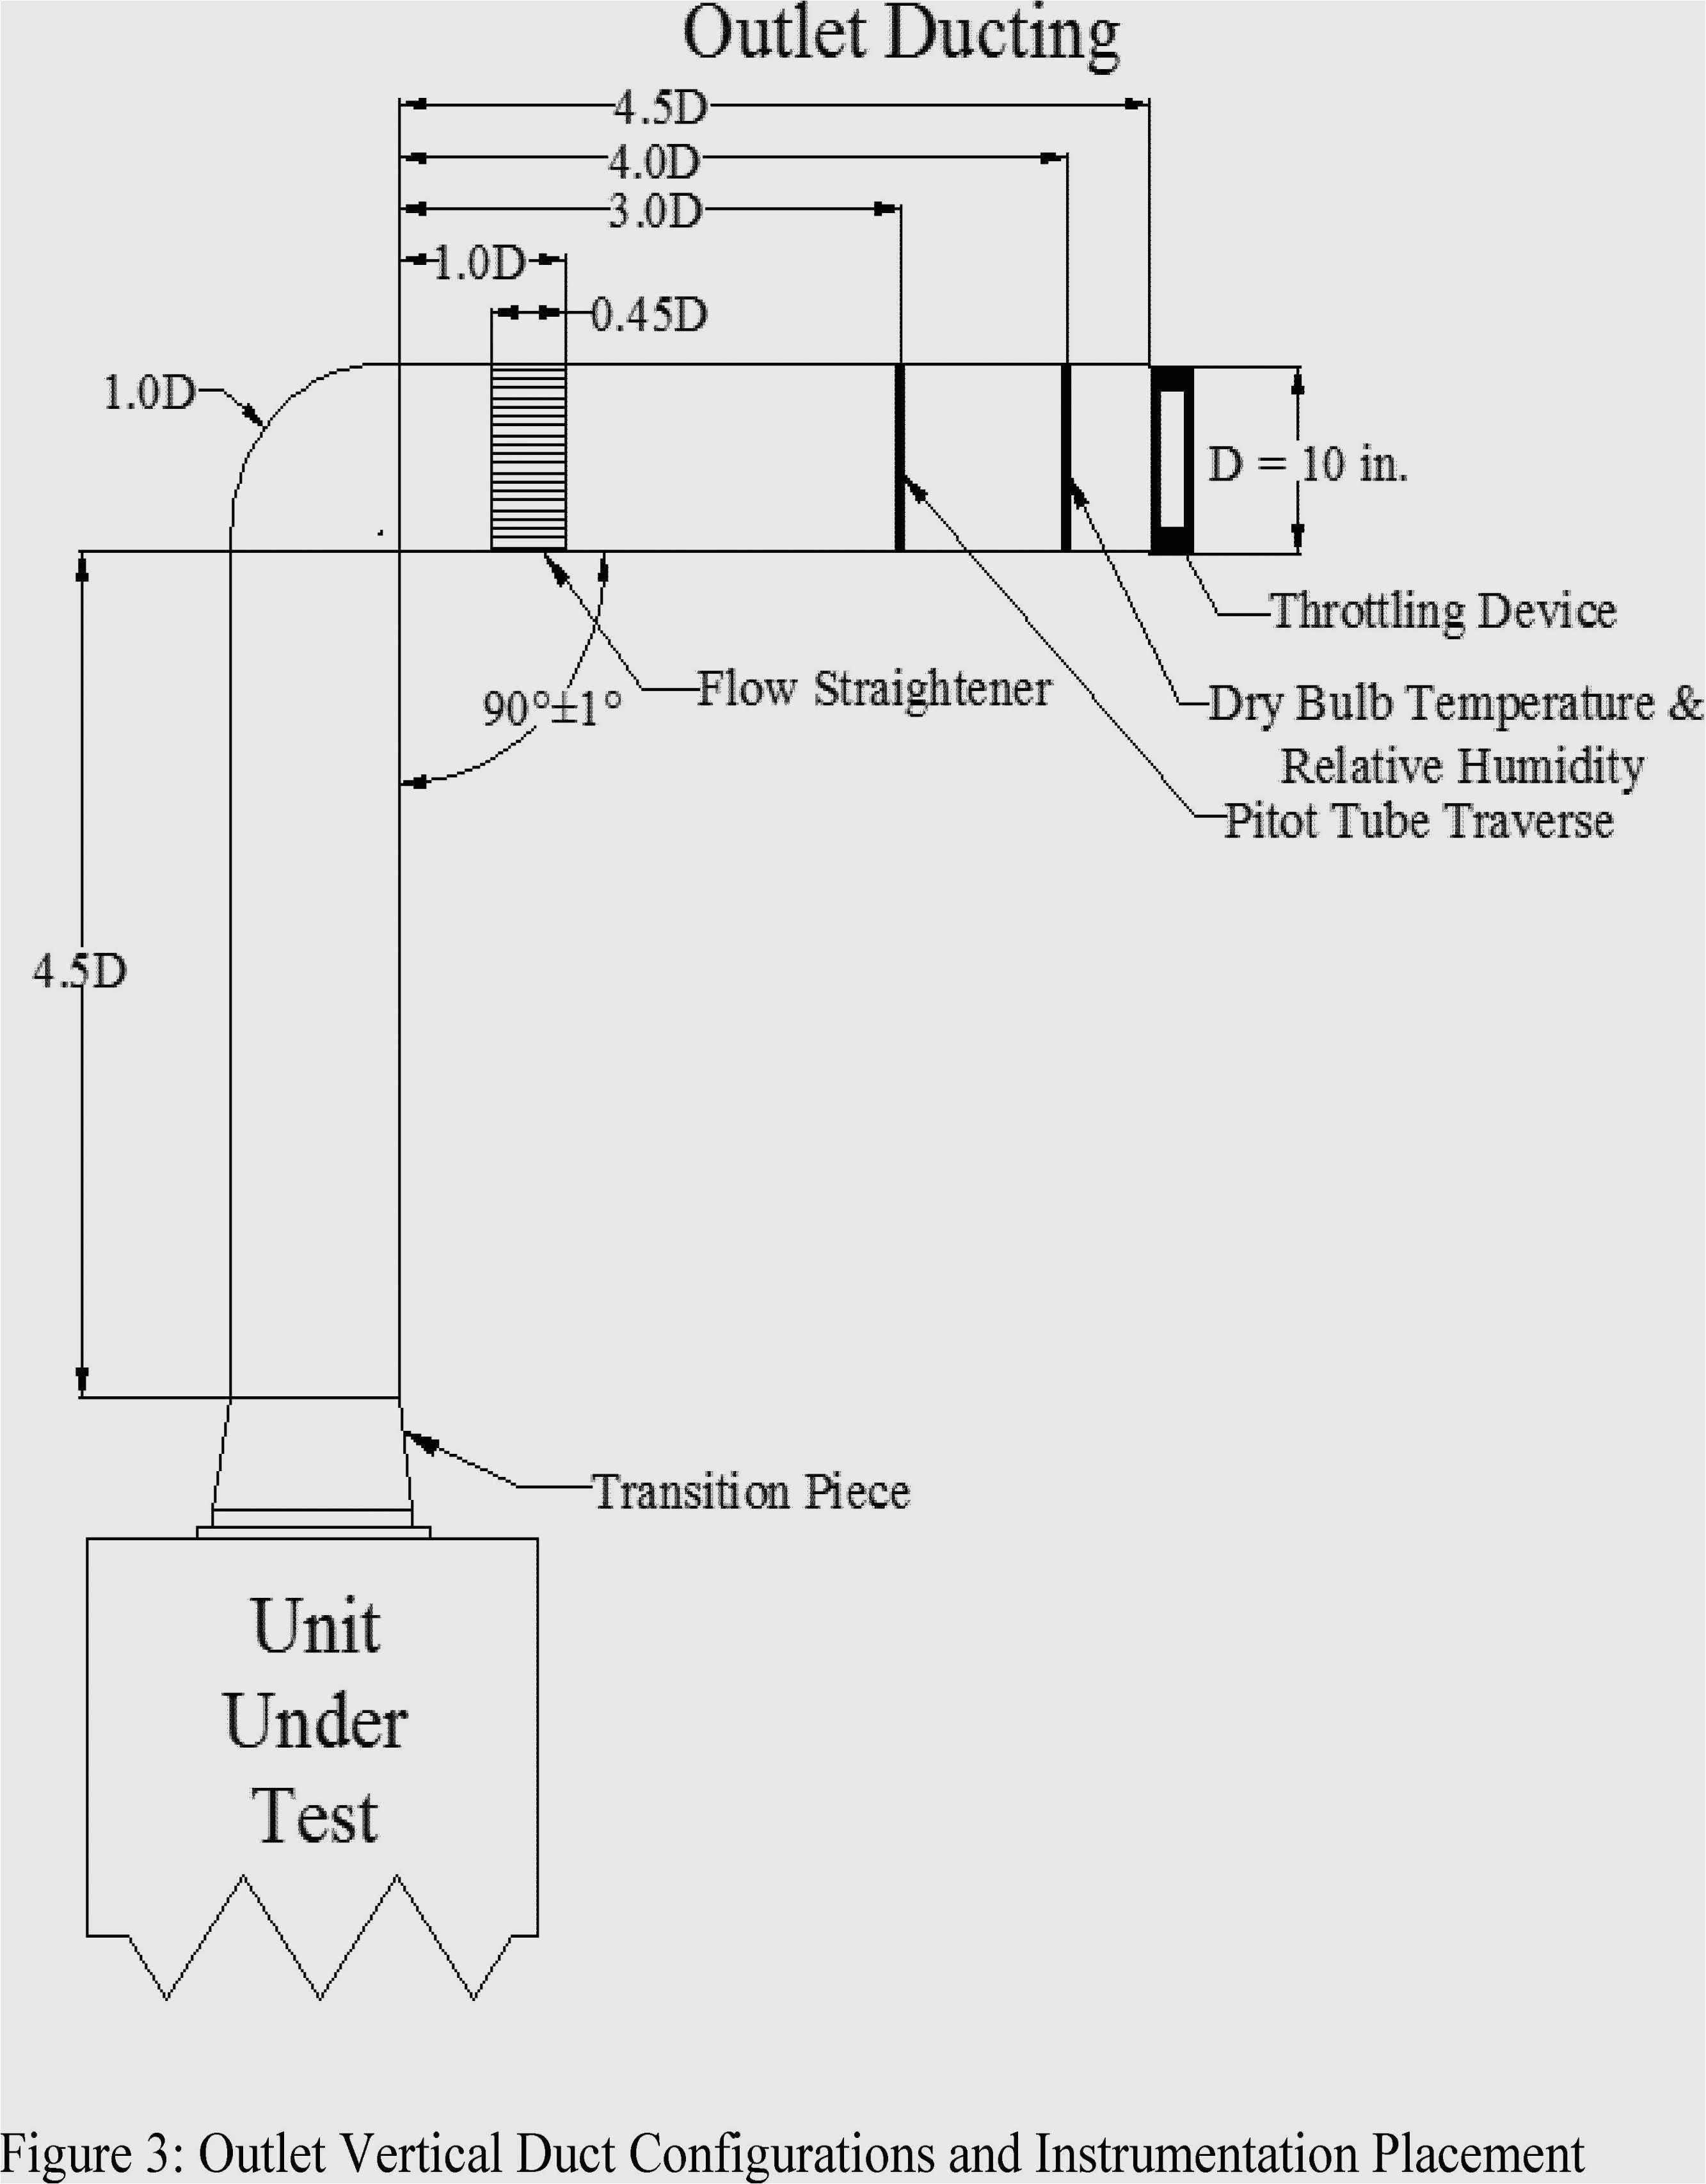 3 Way Wiring Switch Diagram Electrical Wiring Diagram Two Way Switch Wiring Diagram Database